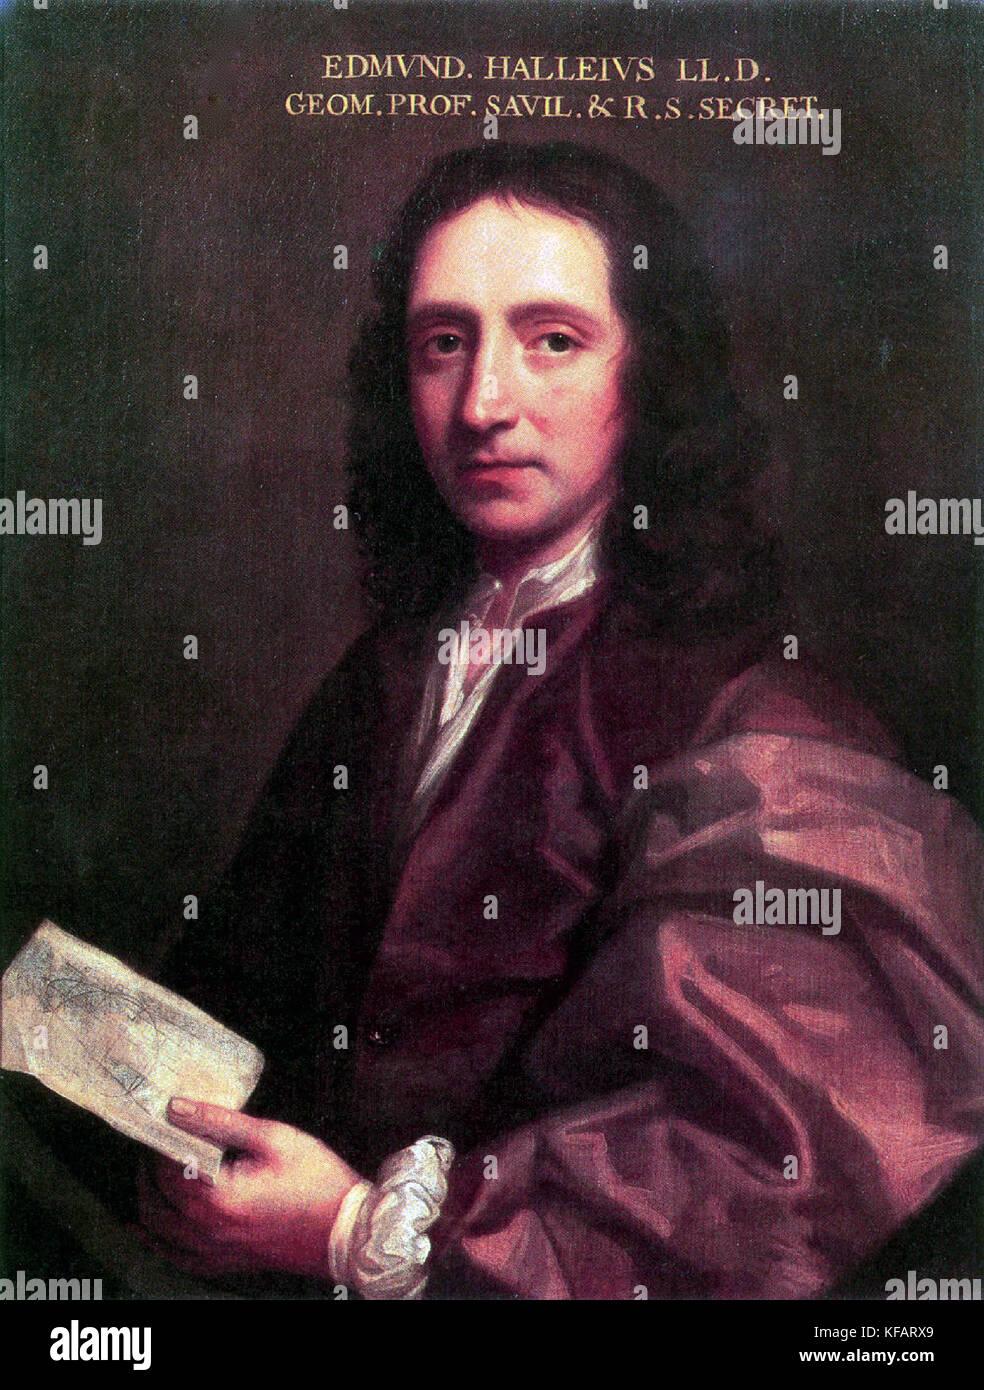 Edmond Halley, Portrait of Edmond Halley 1687 - Stock Image